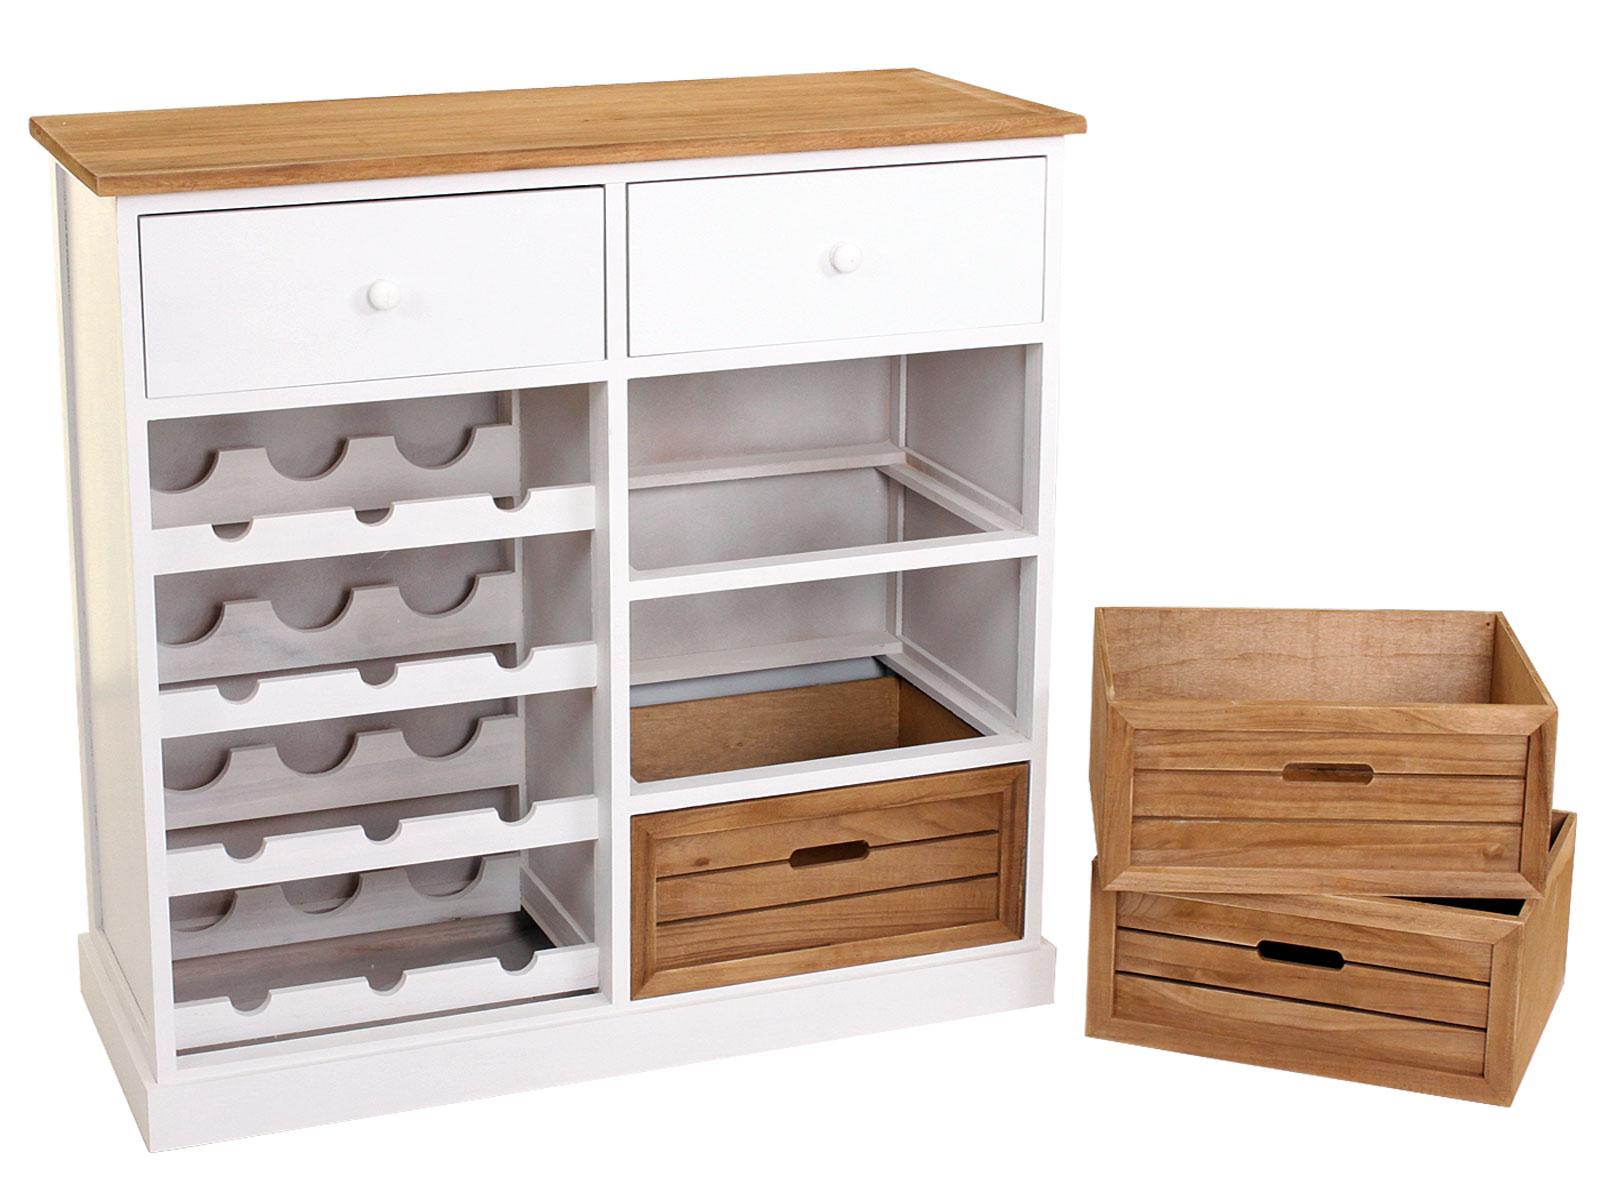 weinregal hwc b96 kommode flaschenregal f r 12 flaschen. Black Bedroom Furniture Sets. Home Design Ideas